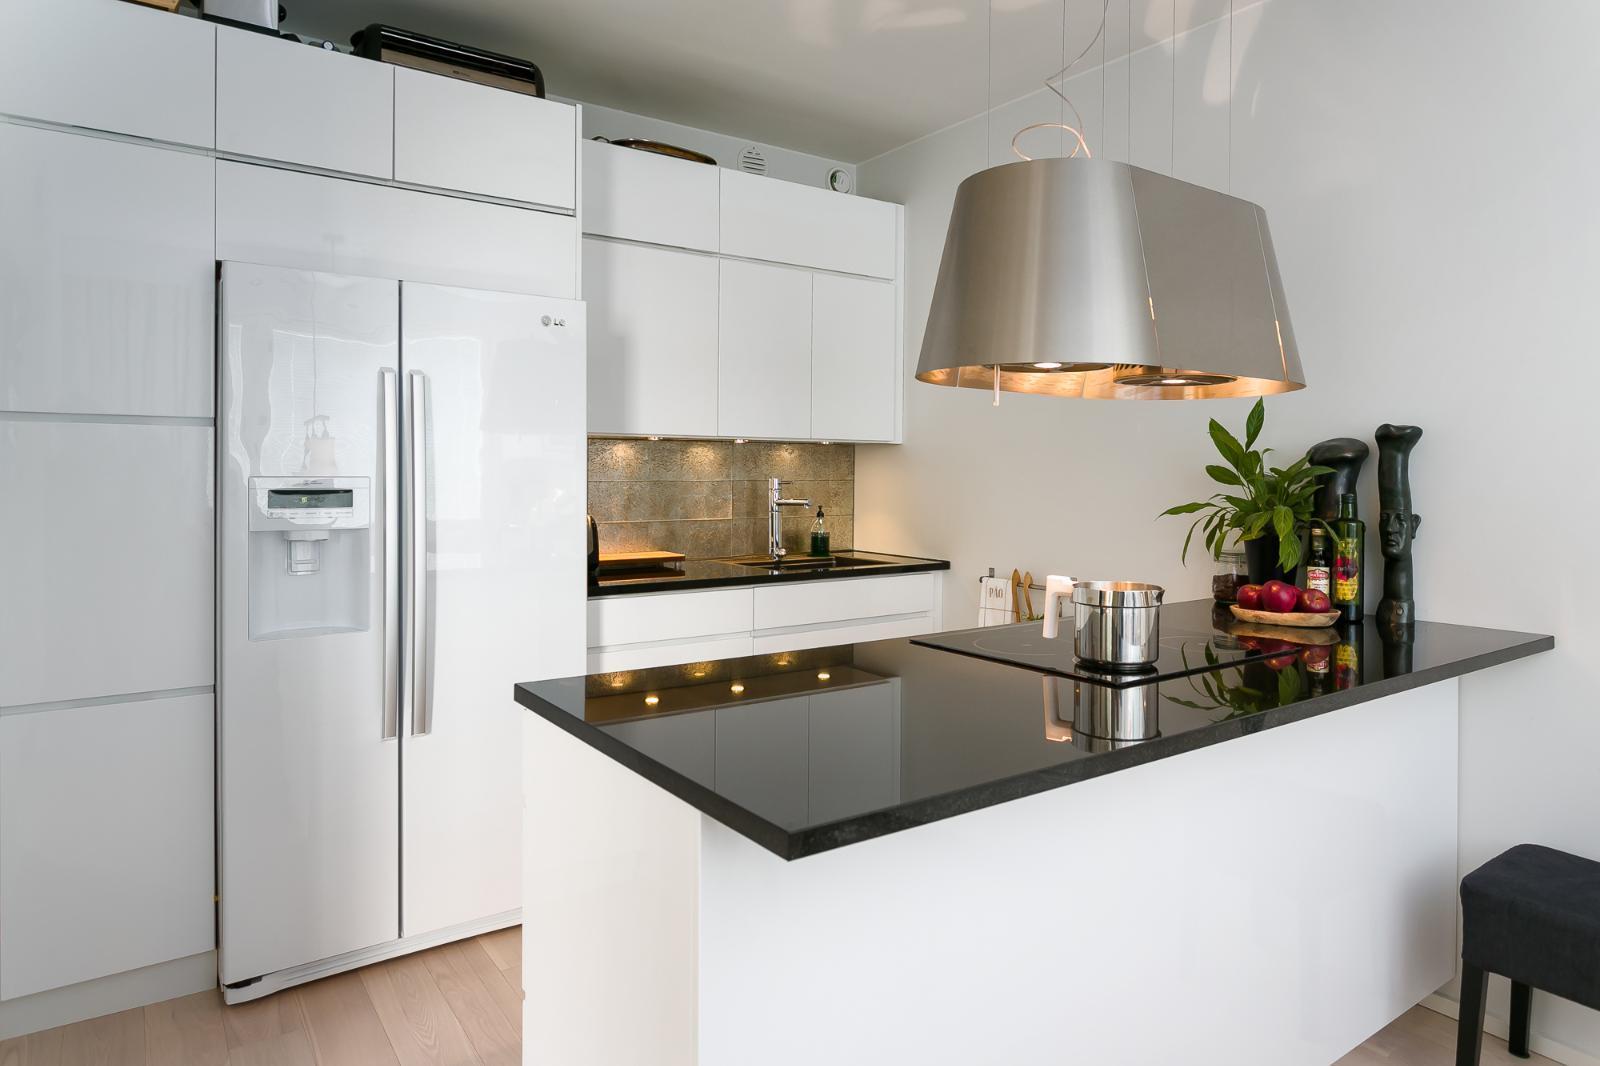 Moderni keittiö 9431660  Etuovi com Ideat & vinkit